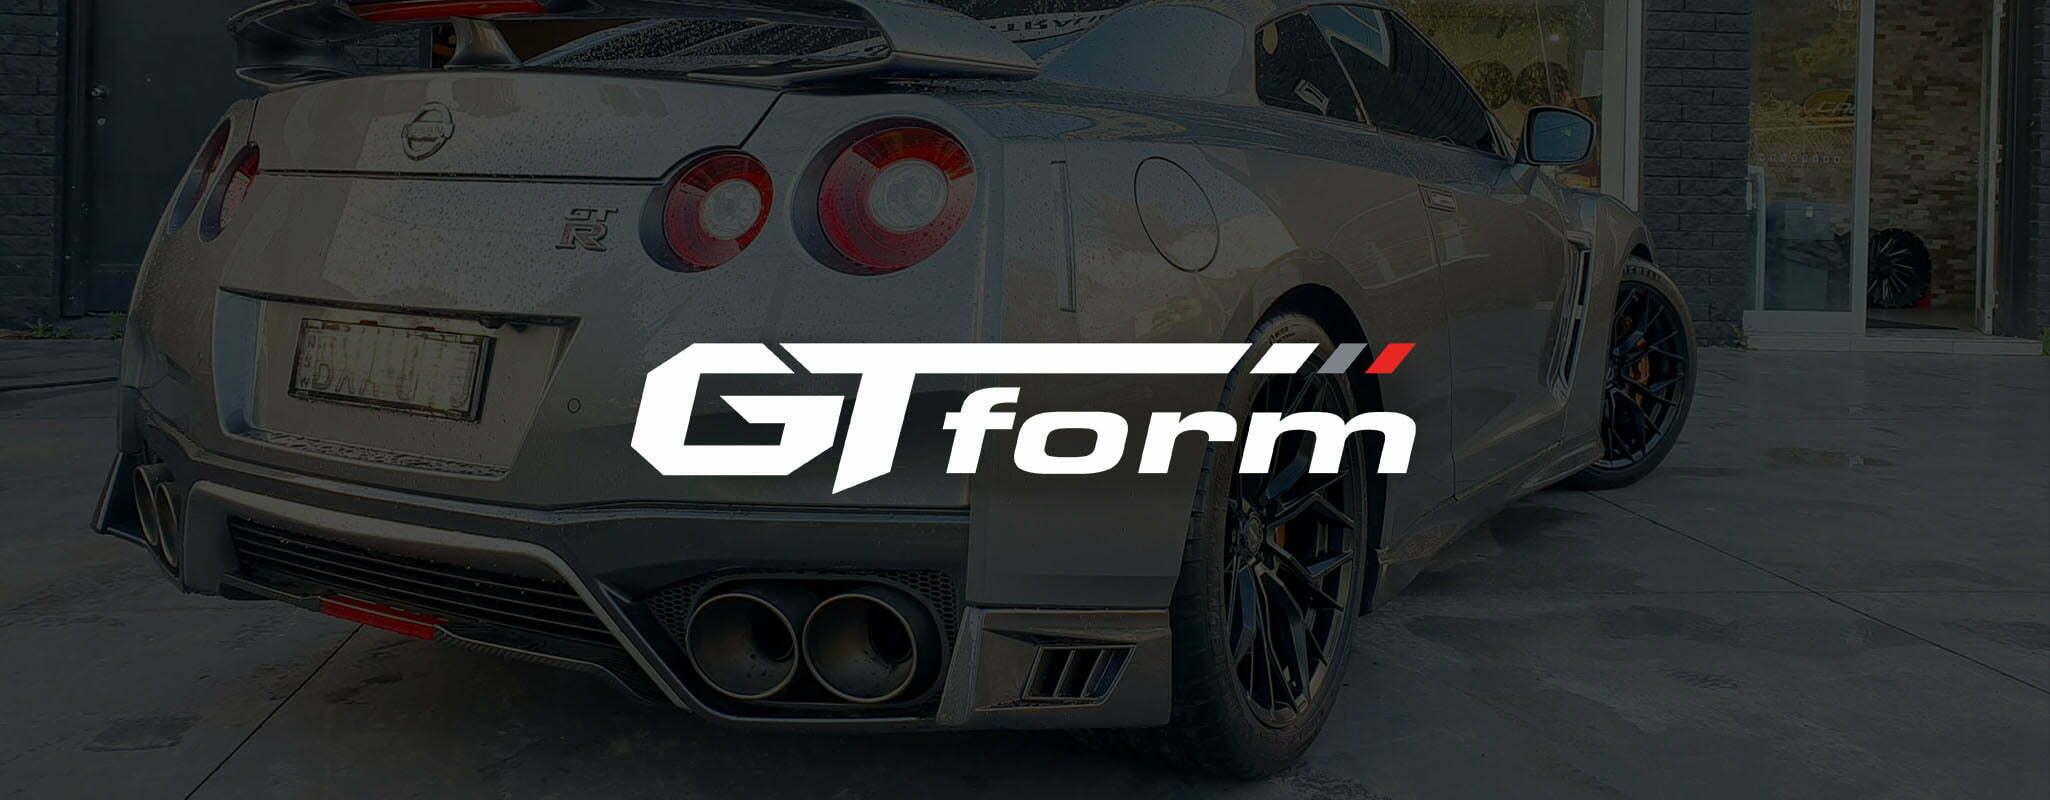 Nissan GTR R34 GT Form Marquee Satin Black Wheels